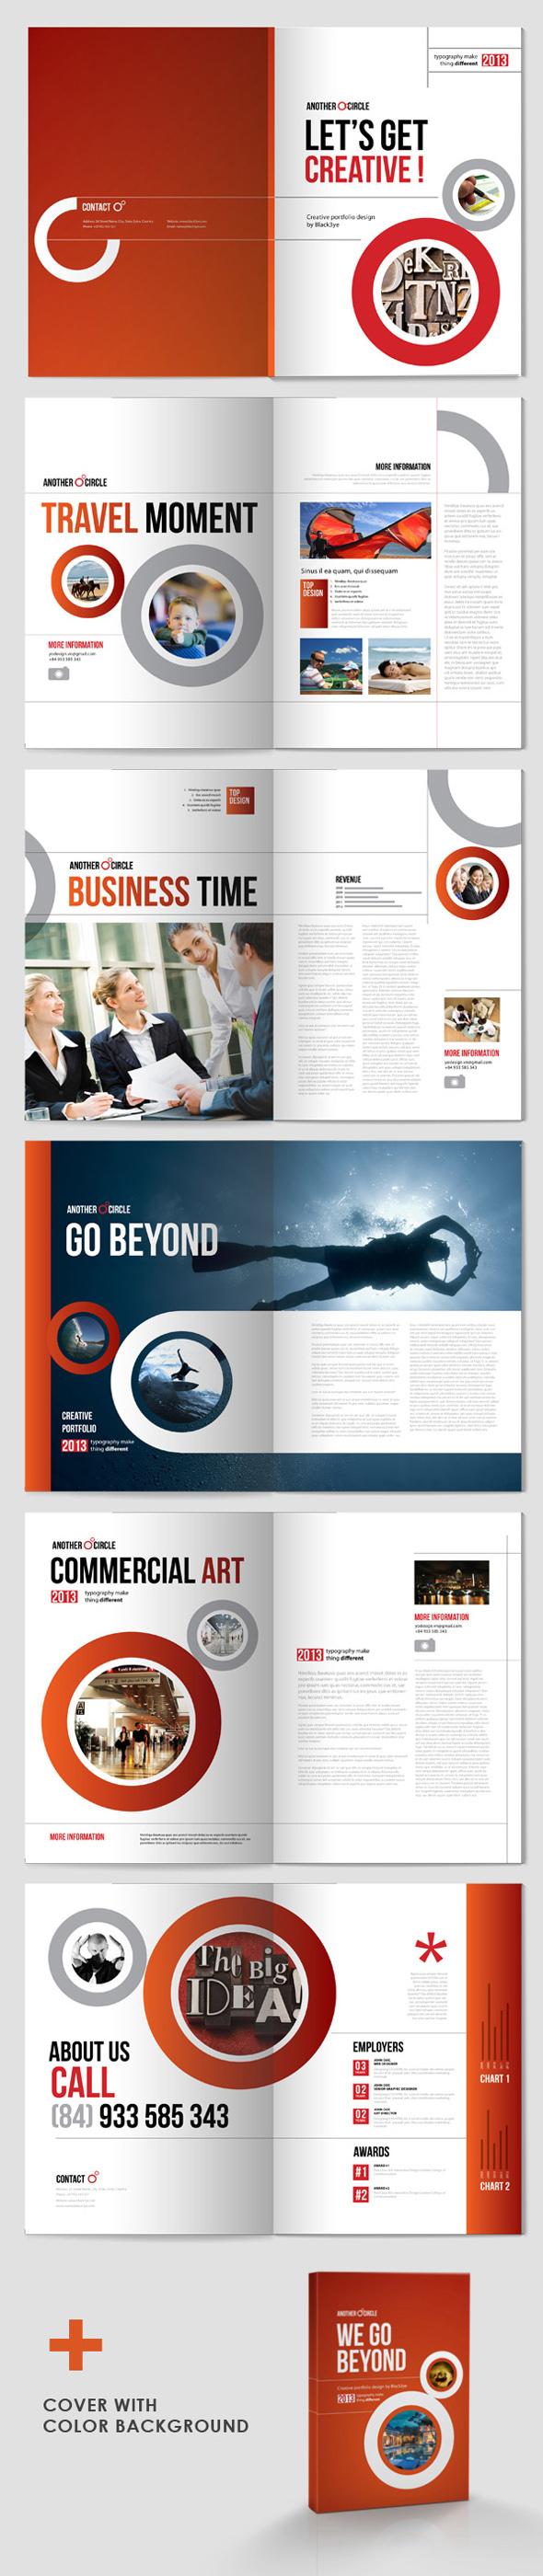 Desain Brosur Perusahaan - Brosur-Perusahaan-Another-Cirle-Brochure-1